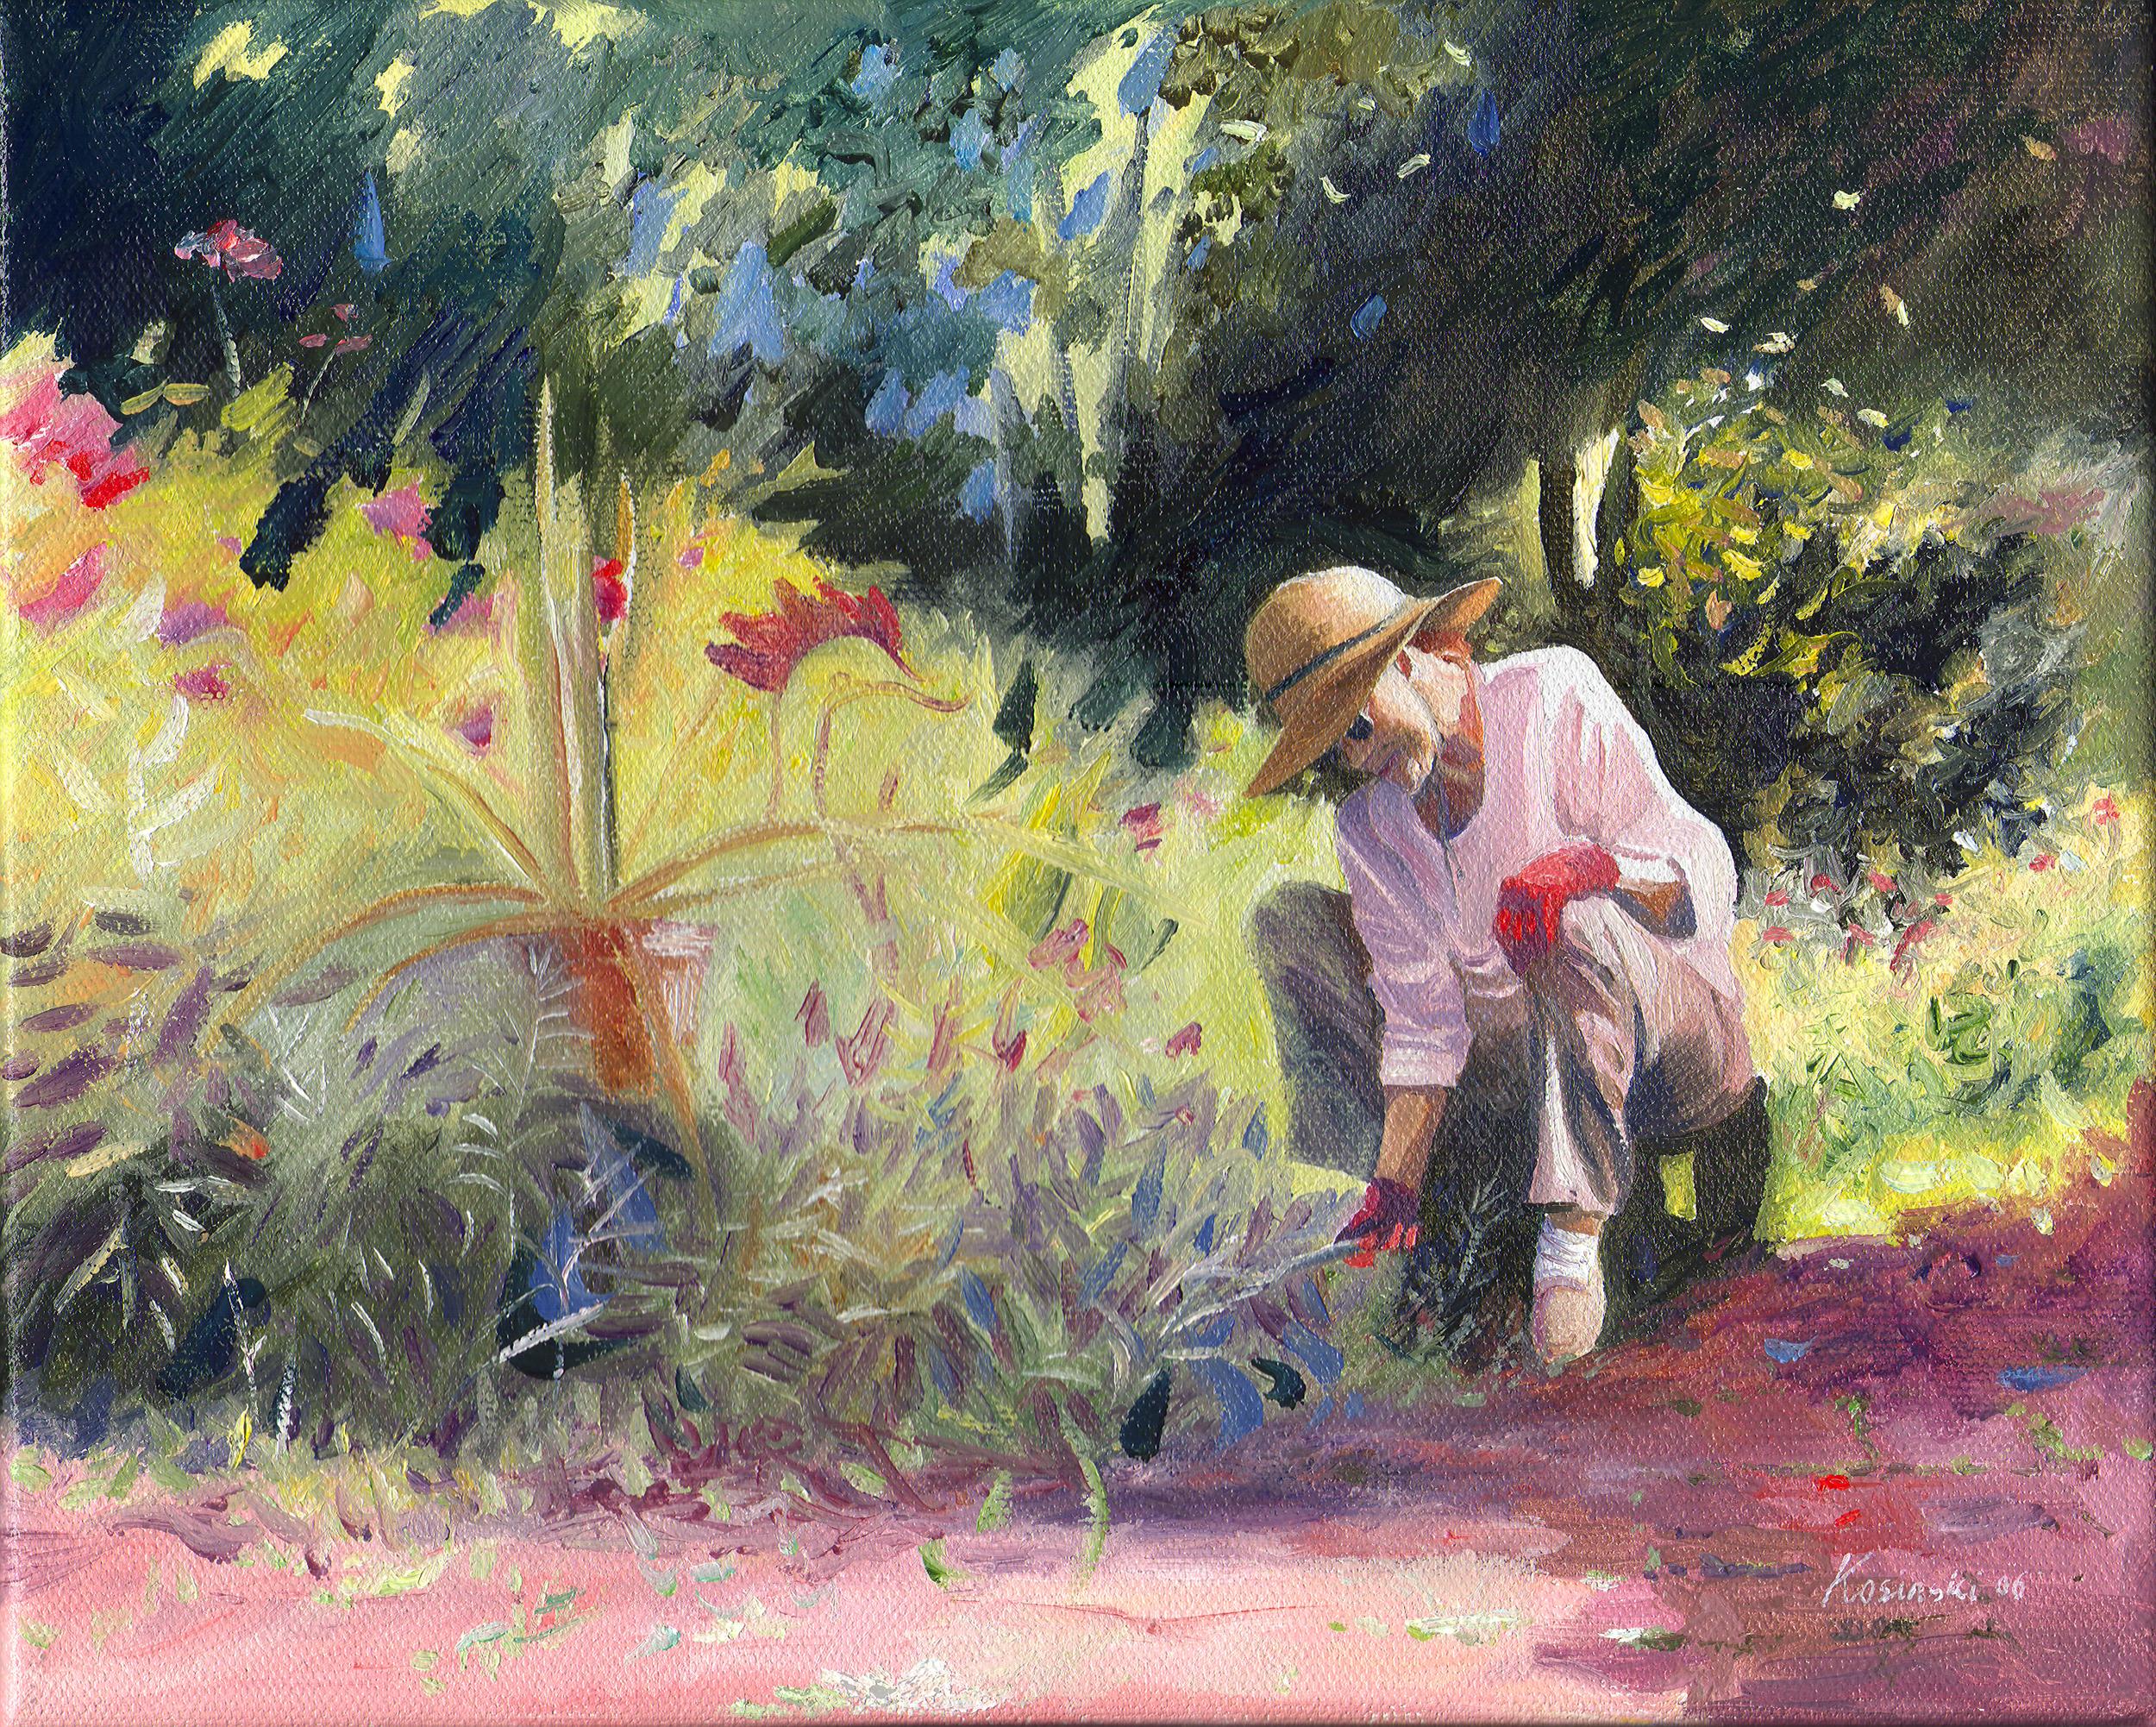 Marjorie, Grassy Creek